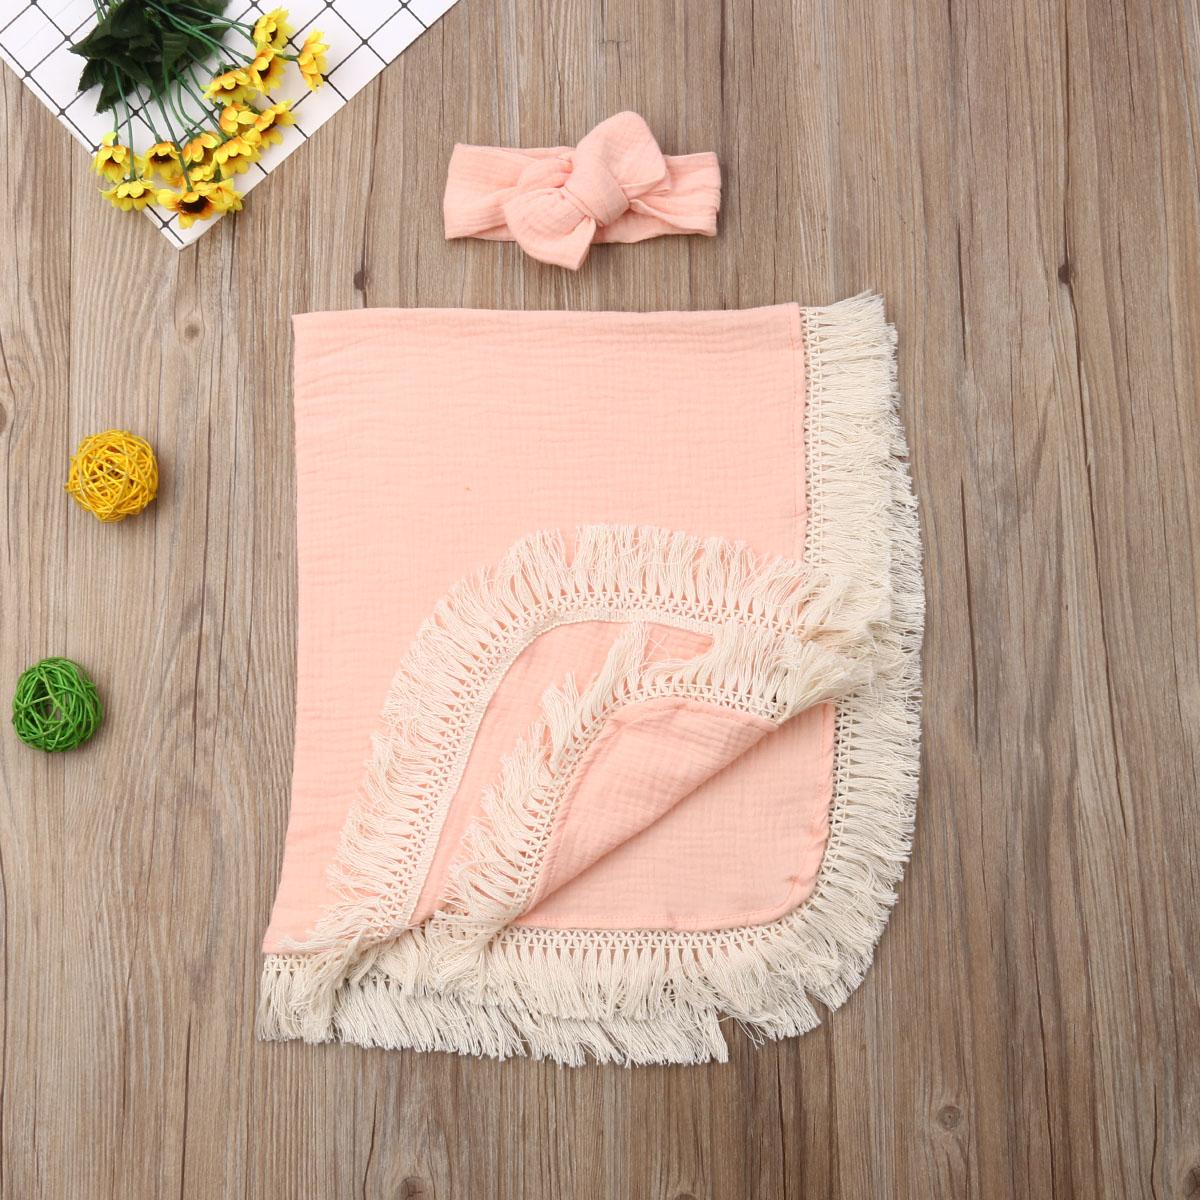 2PCS Newborn Baby Girls Boys Swaddle Wrap Tassels Sleeping Bag+Hat Cotton Outfits Set For Newborn Baby 0-6M